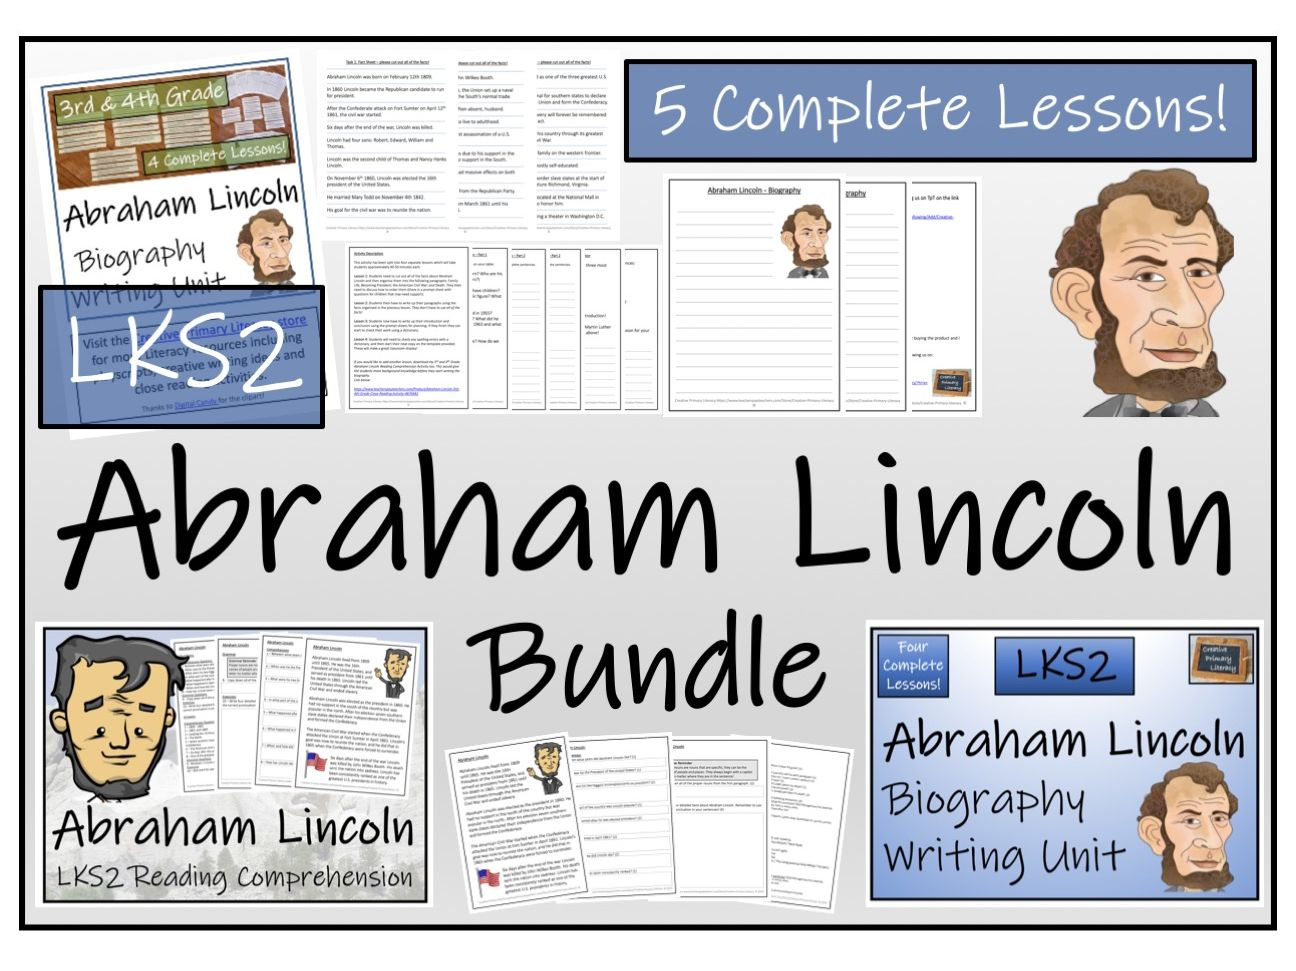 LKS2 History - Abraham Lincoln Reading Comprehension & Biography Bundle